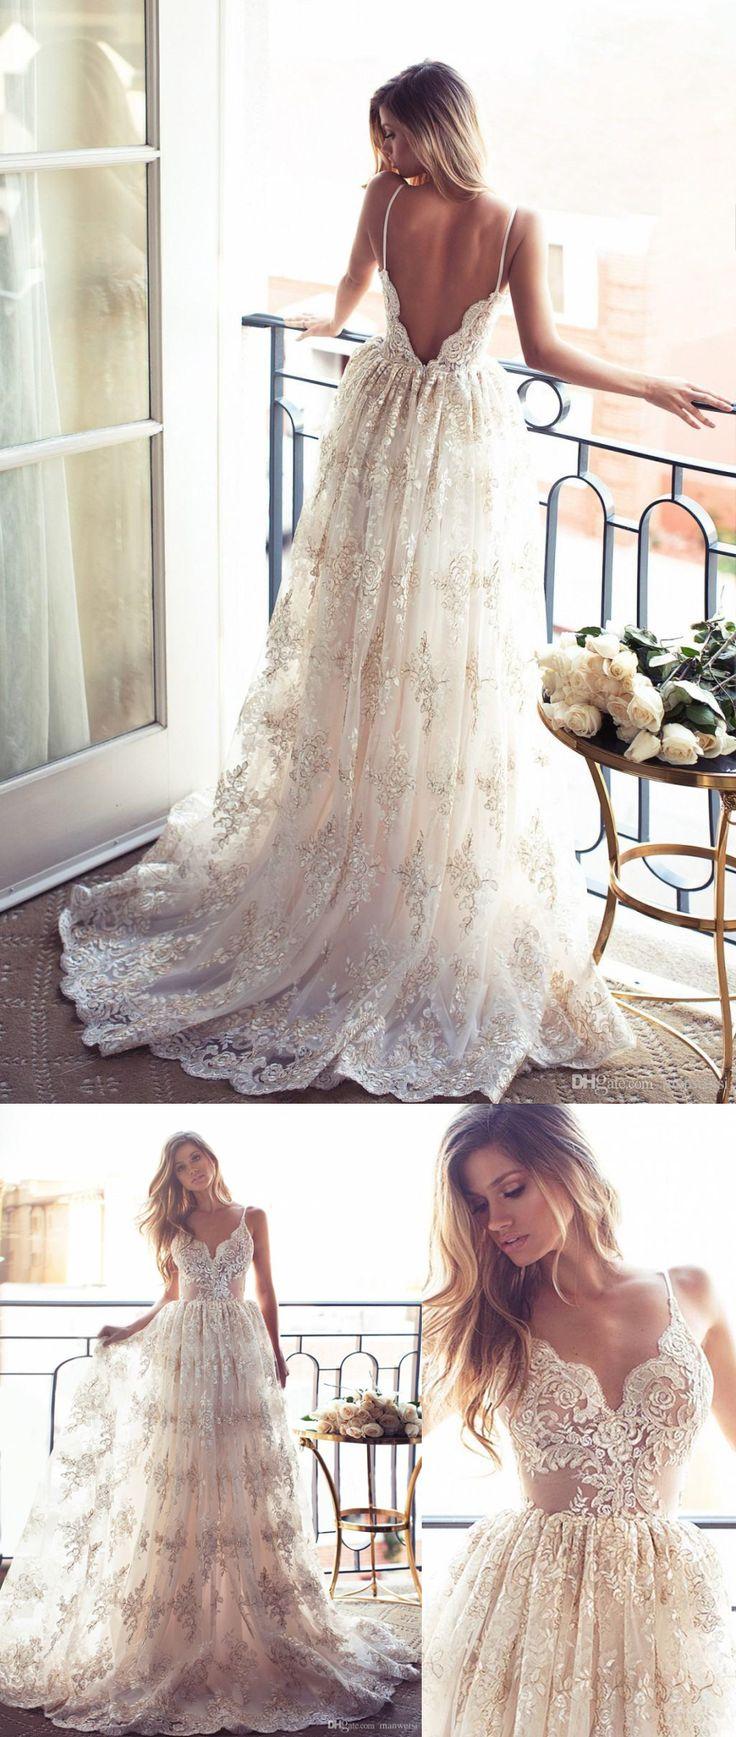 Best 25 spaghetti strap wedding dress ideas on pinterest for Sexy summer wedding dress